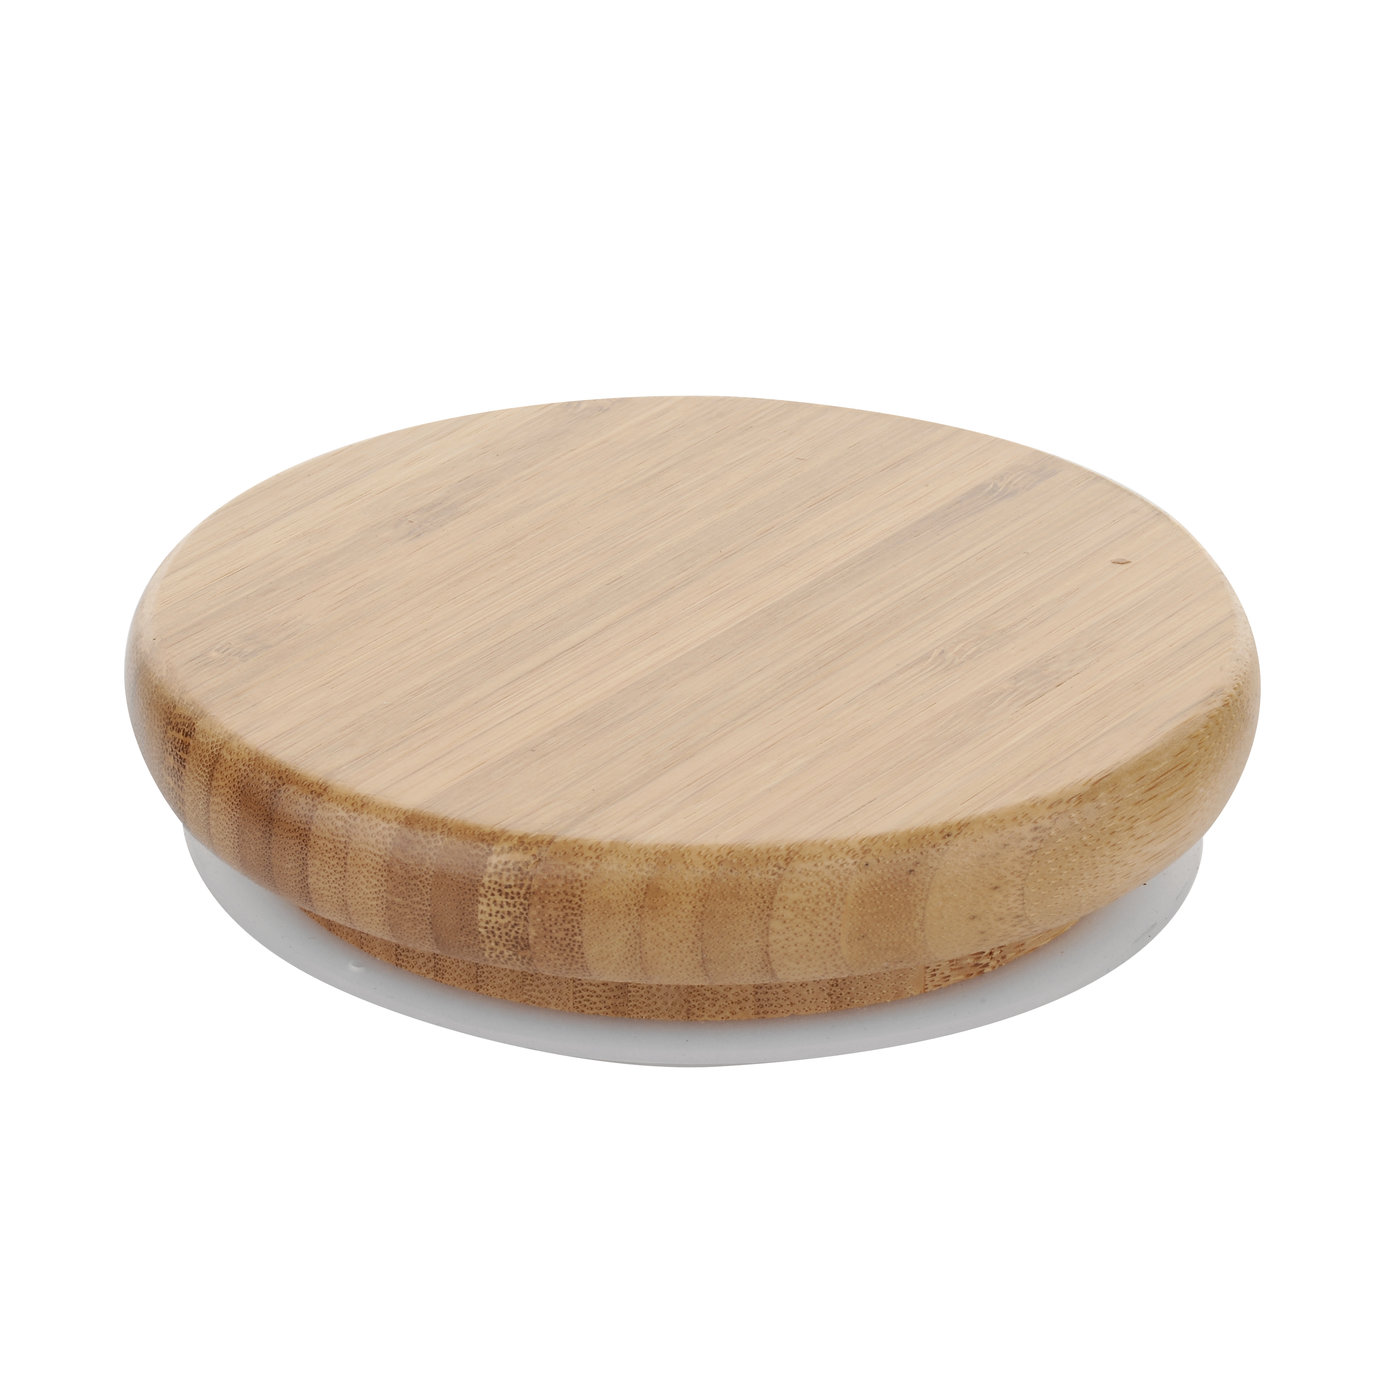 Wooden Lids